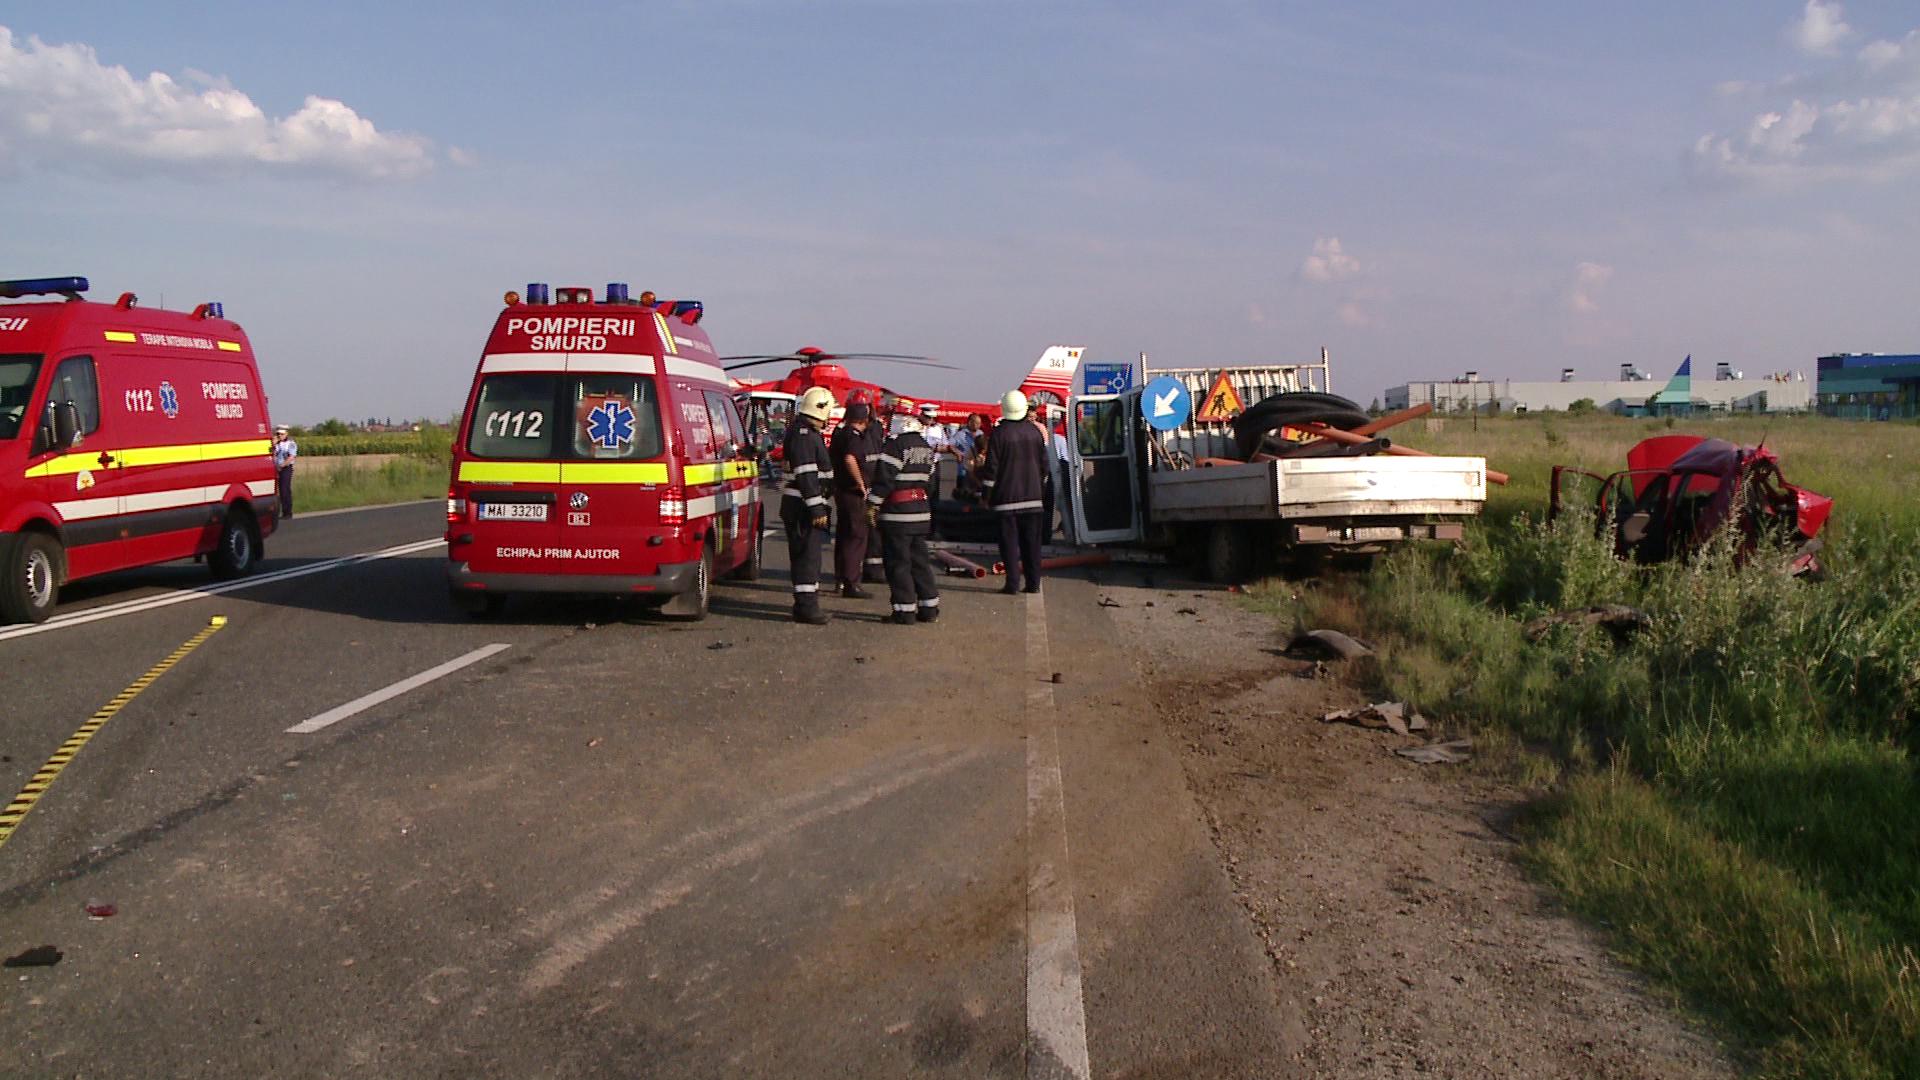 Femeie insarcinata,preluata de elicopterul SMURD in urma unui grav accident petrecut la Recas